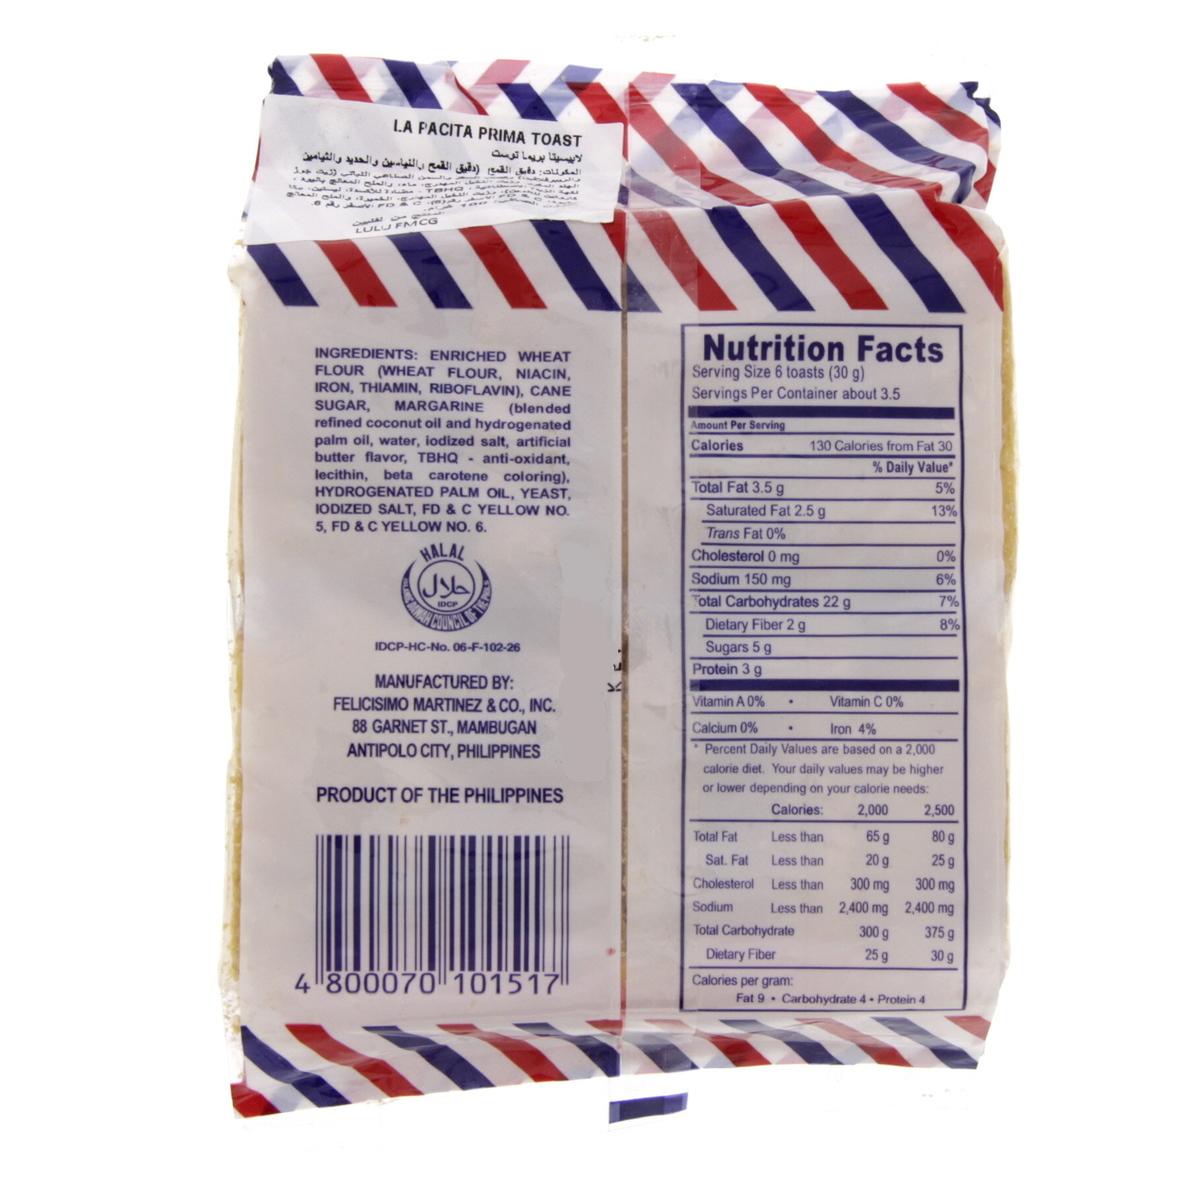 Buy La Pacita Prima Toast 100g - Filipino - Lulu Webstore QATAR